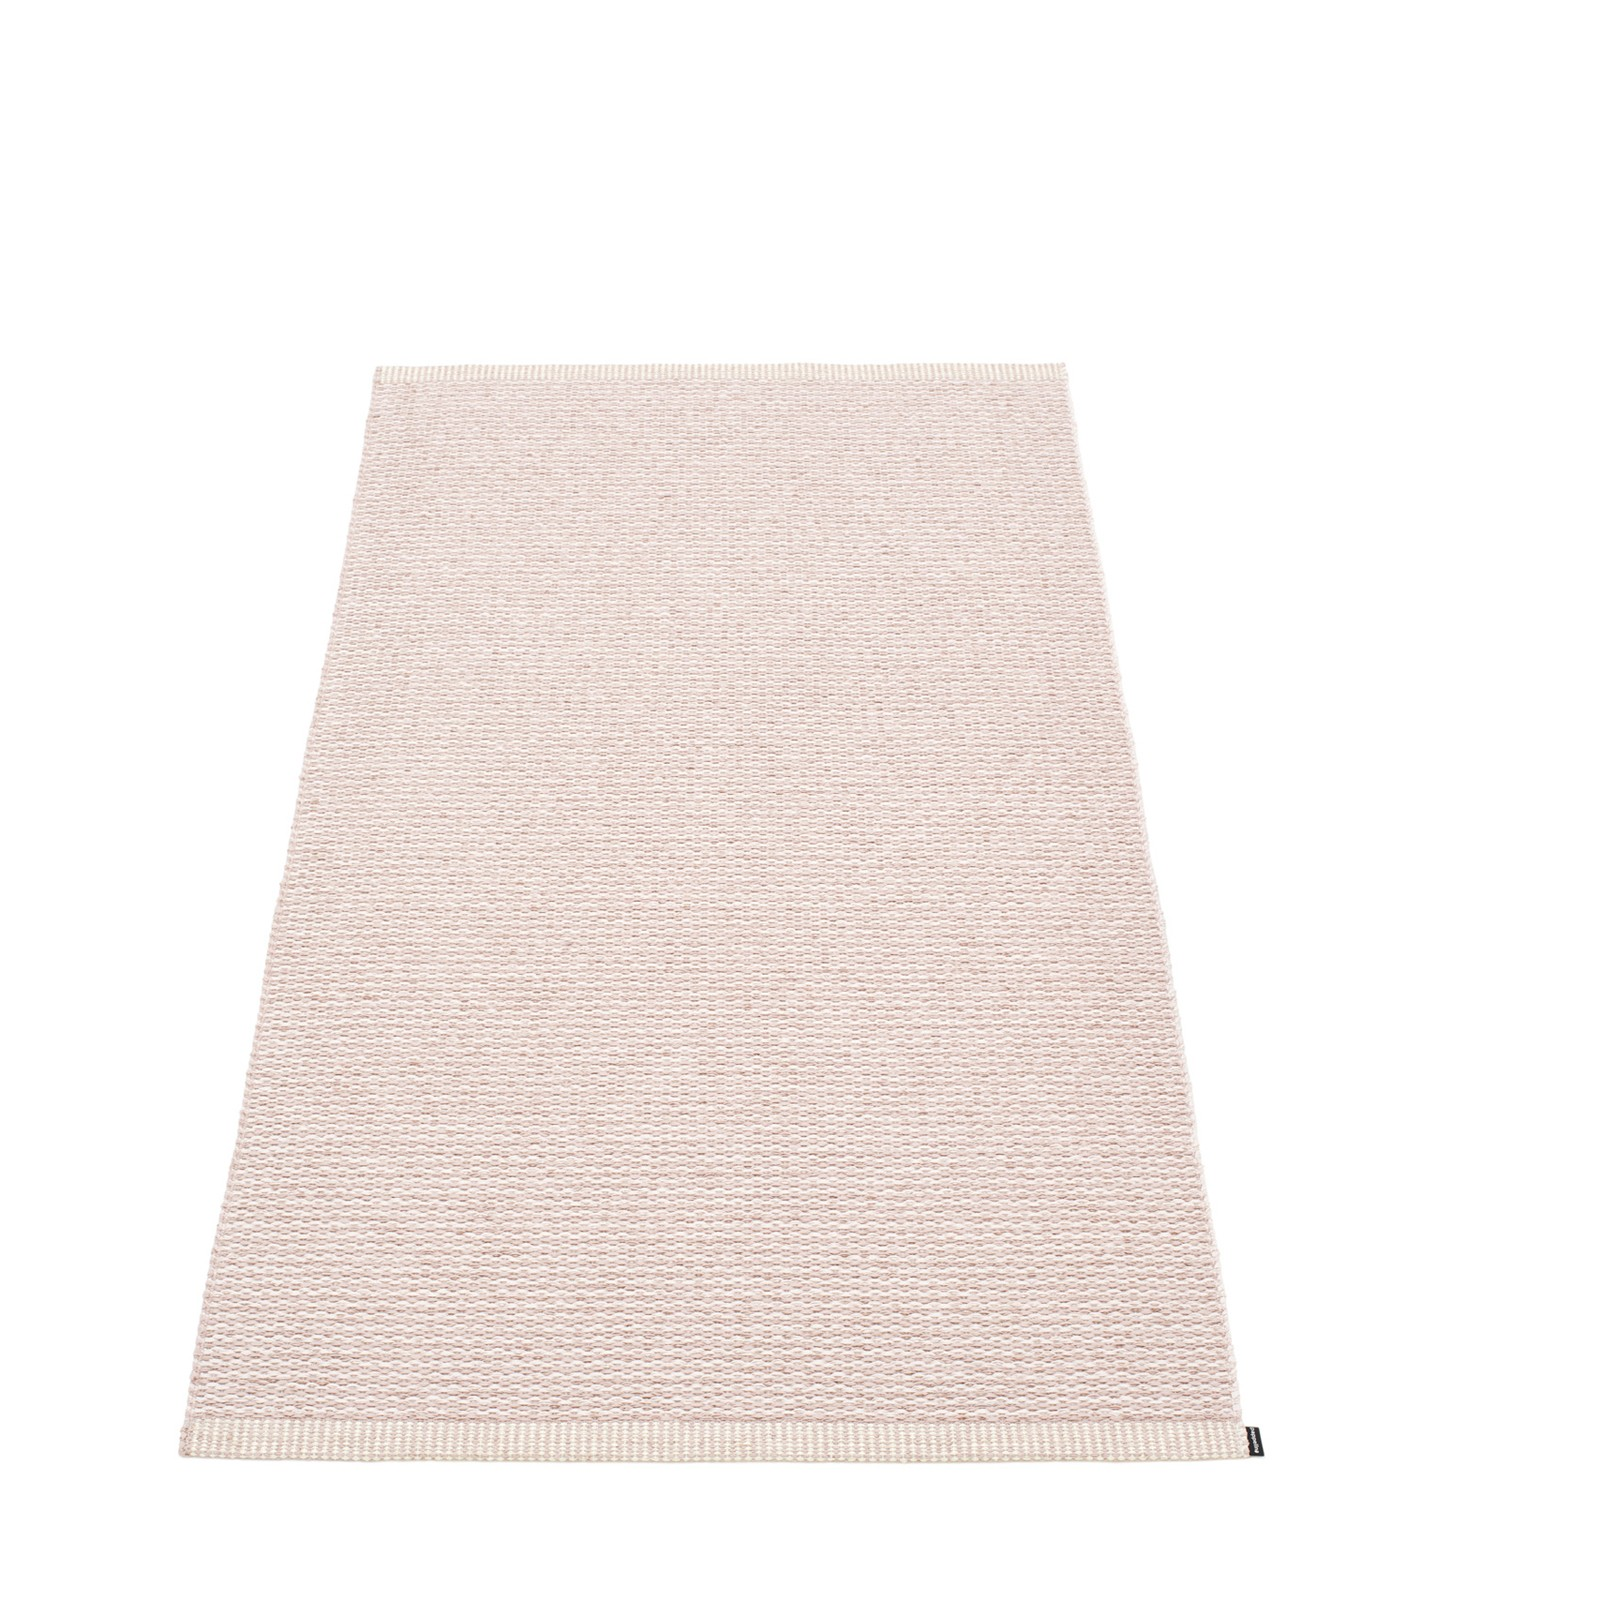 Pappelina Läufer pappelina mono läufer kunststoffteppich farbe pale in